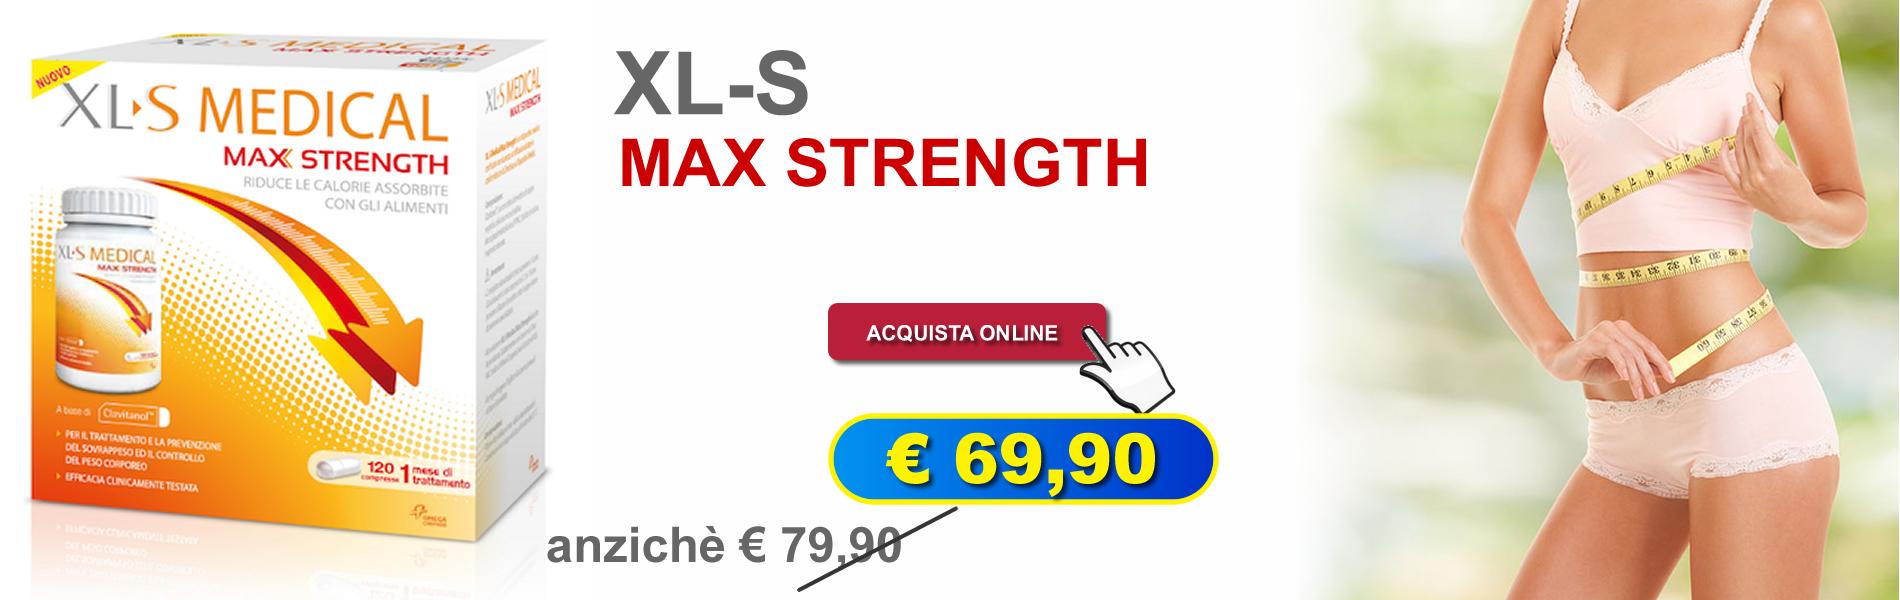 maxstrength-XLS